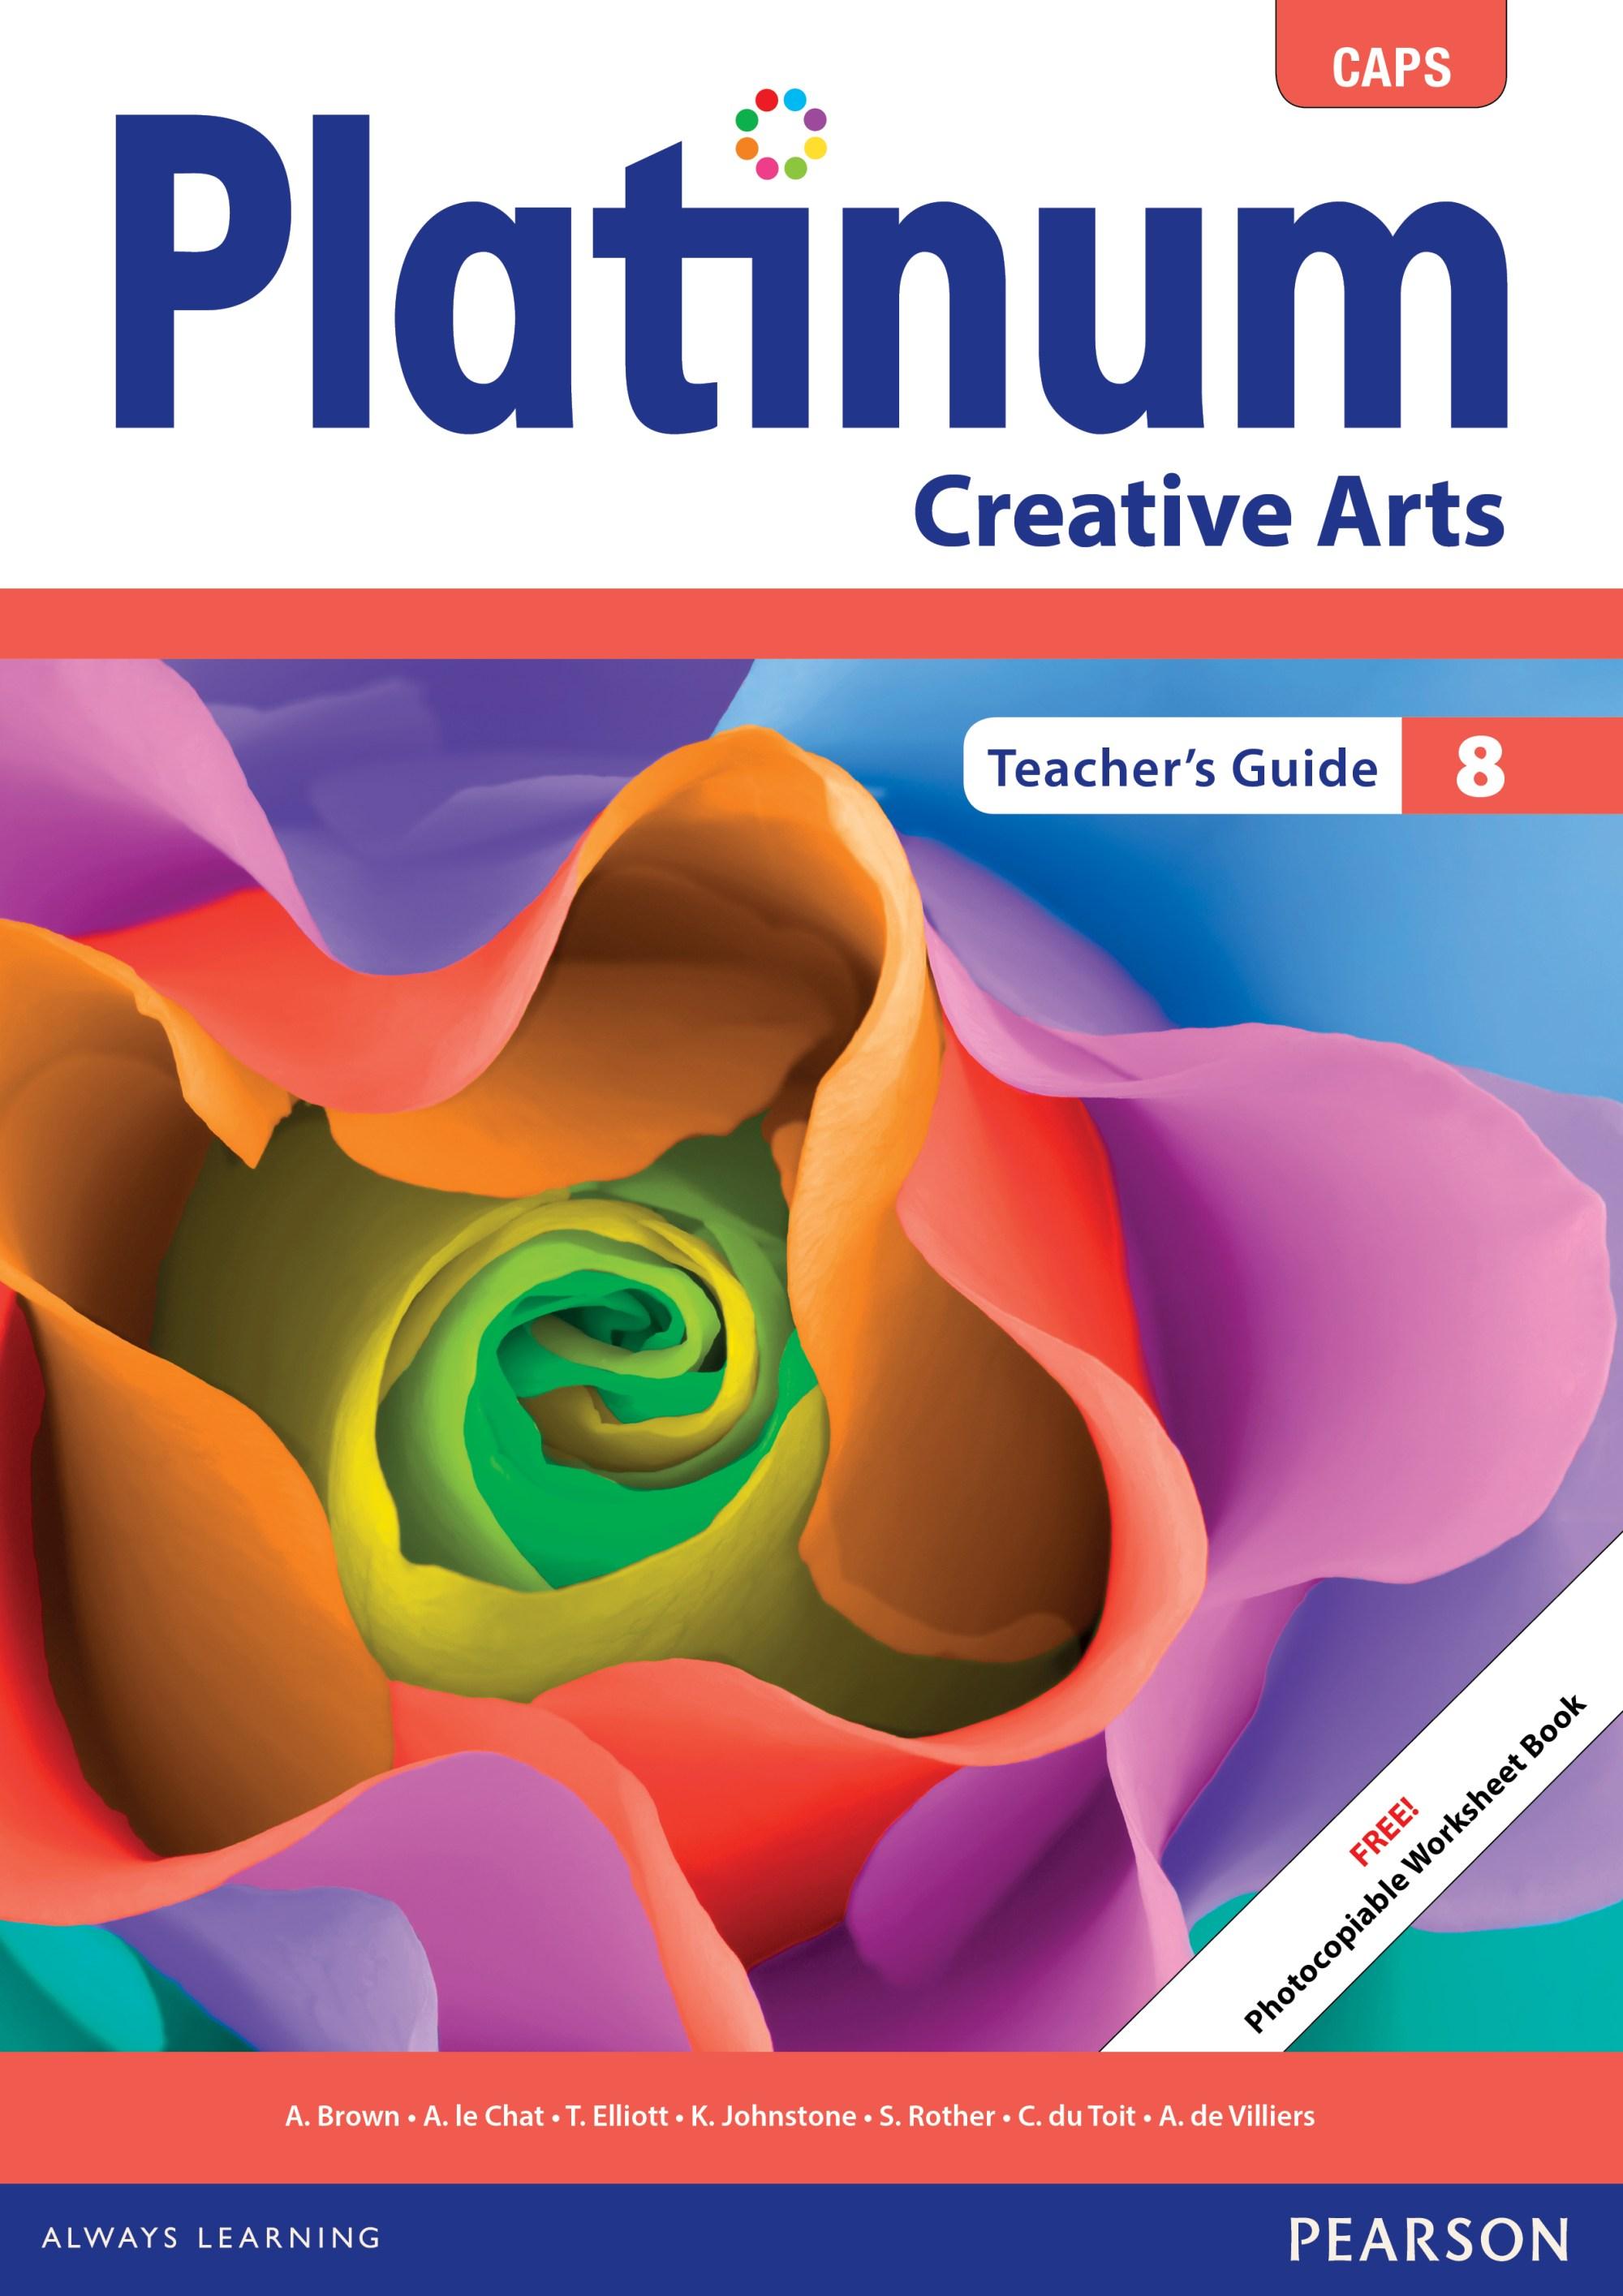 hight resolution of Platinum Creative Arts Grade 8 Teacher's Guide ePDF (perpetual licence)    WCED ePortal